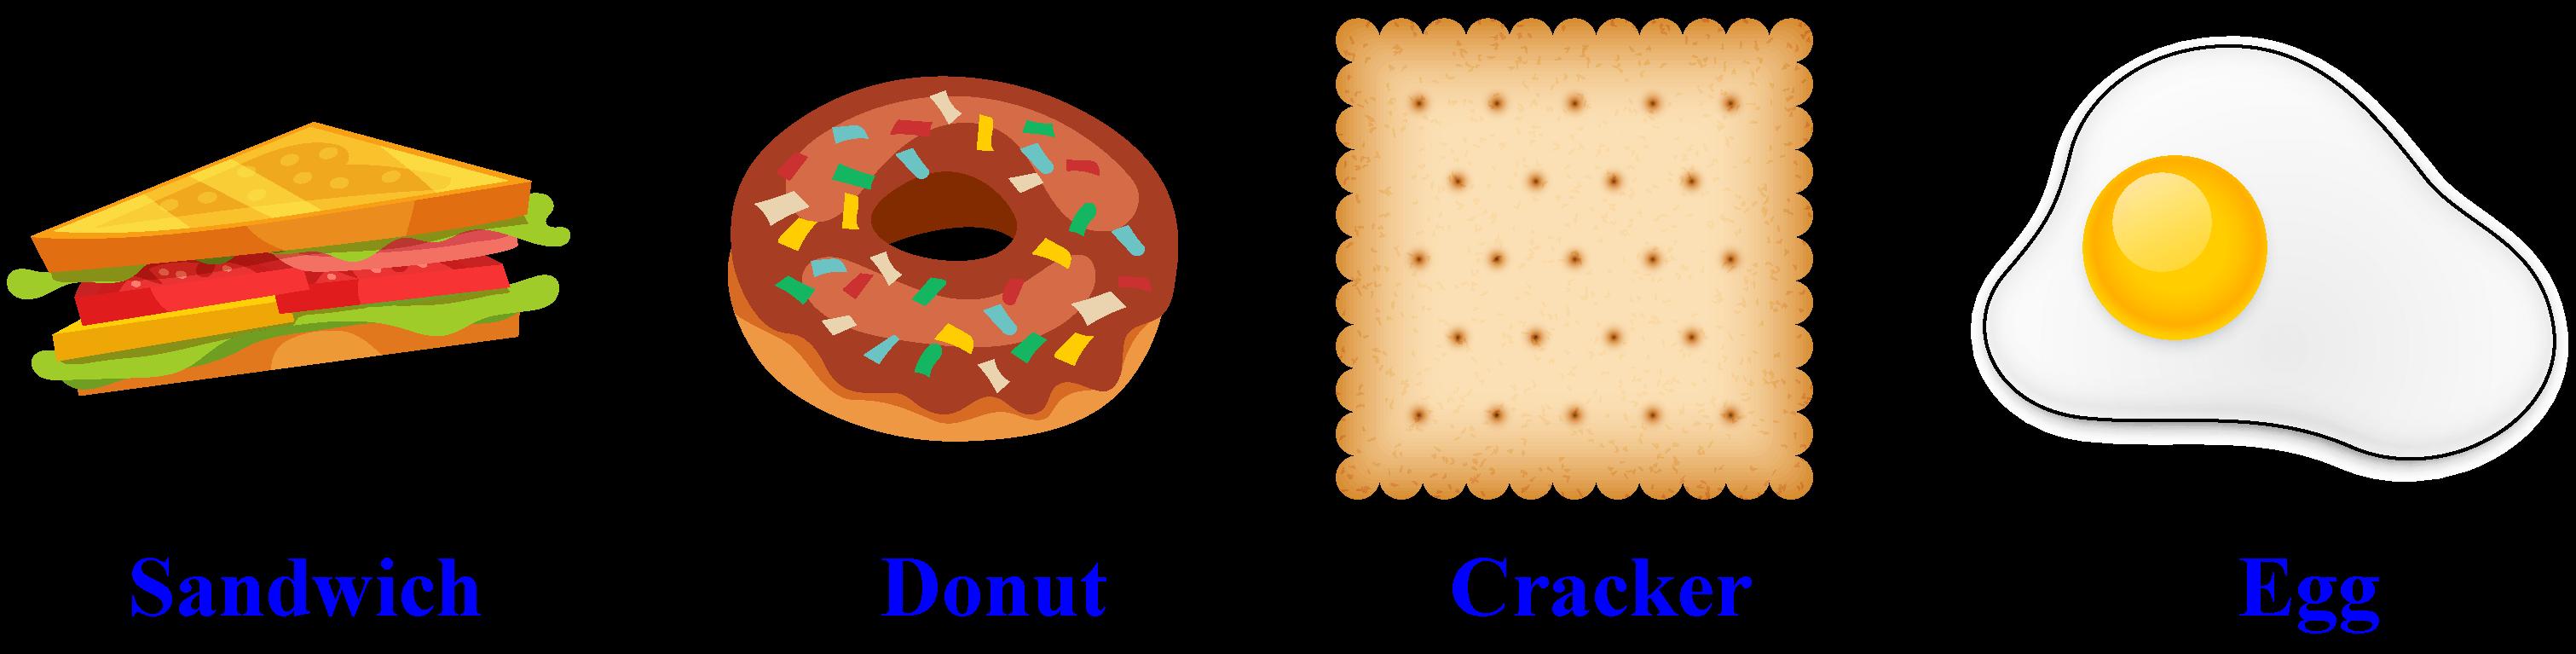 Shapes around us - A half-sandwich, a donut, a cracker, a fried egg